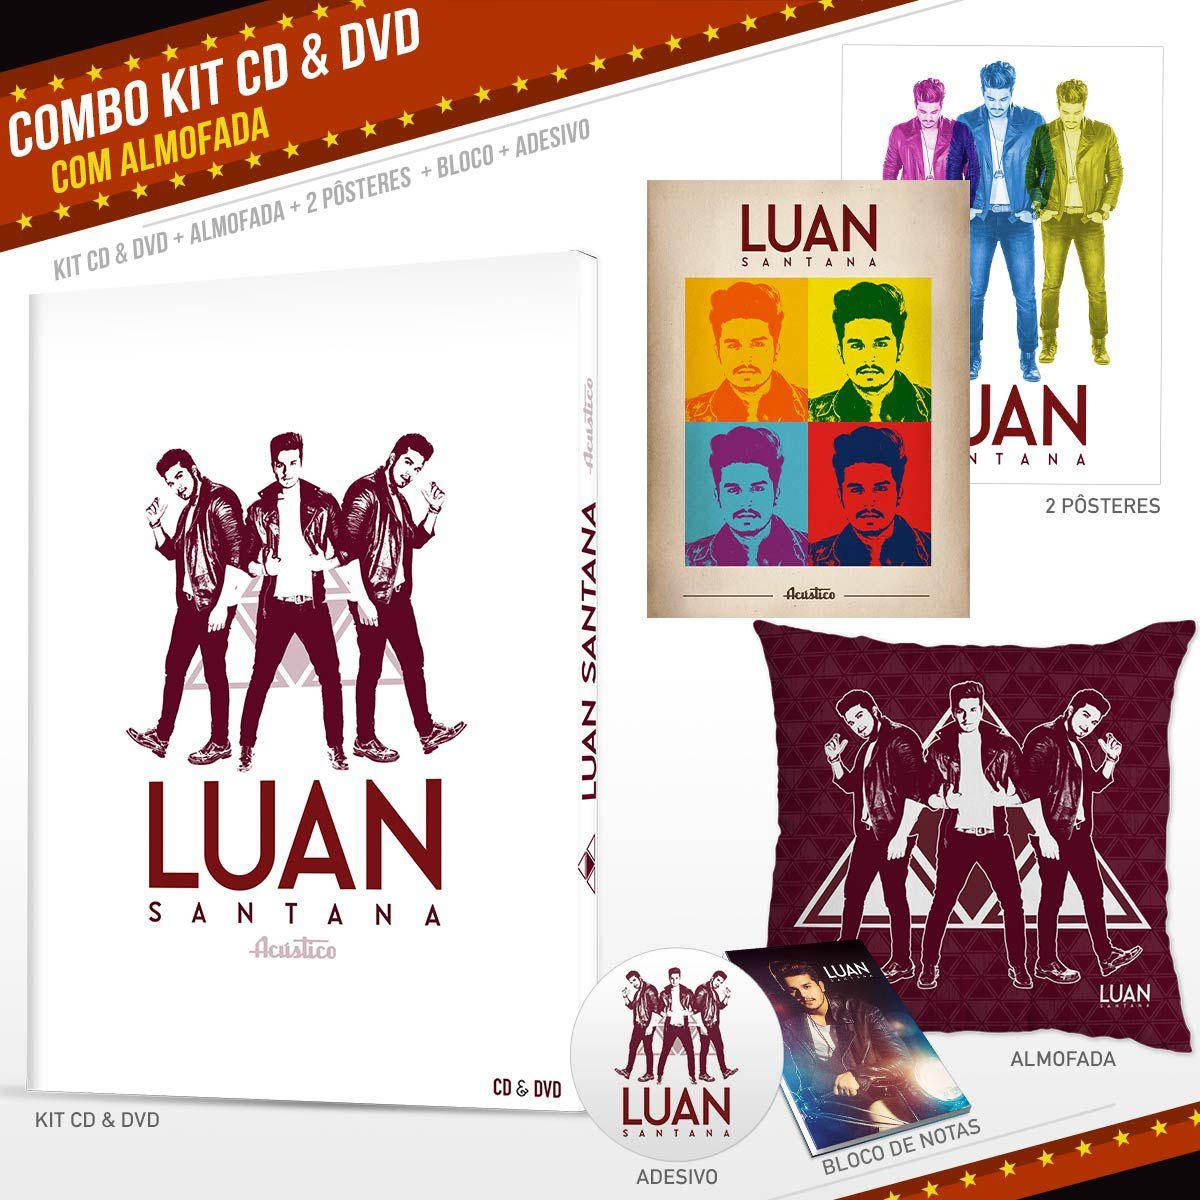 Combo com Kit CD & DVD Luan Santana Acústico + Almofada